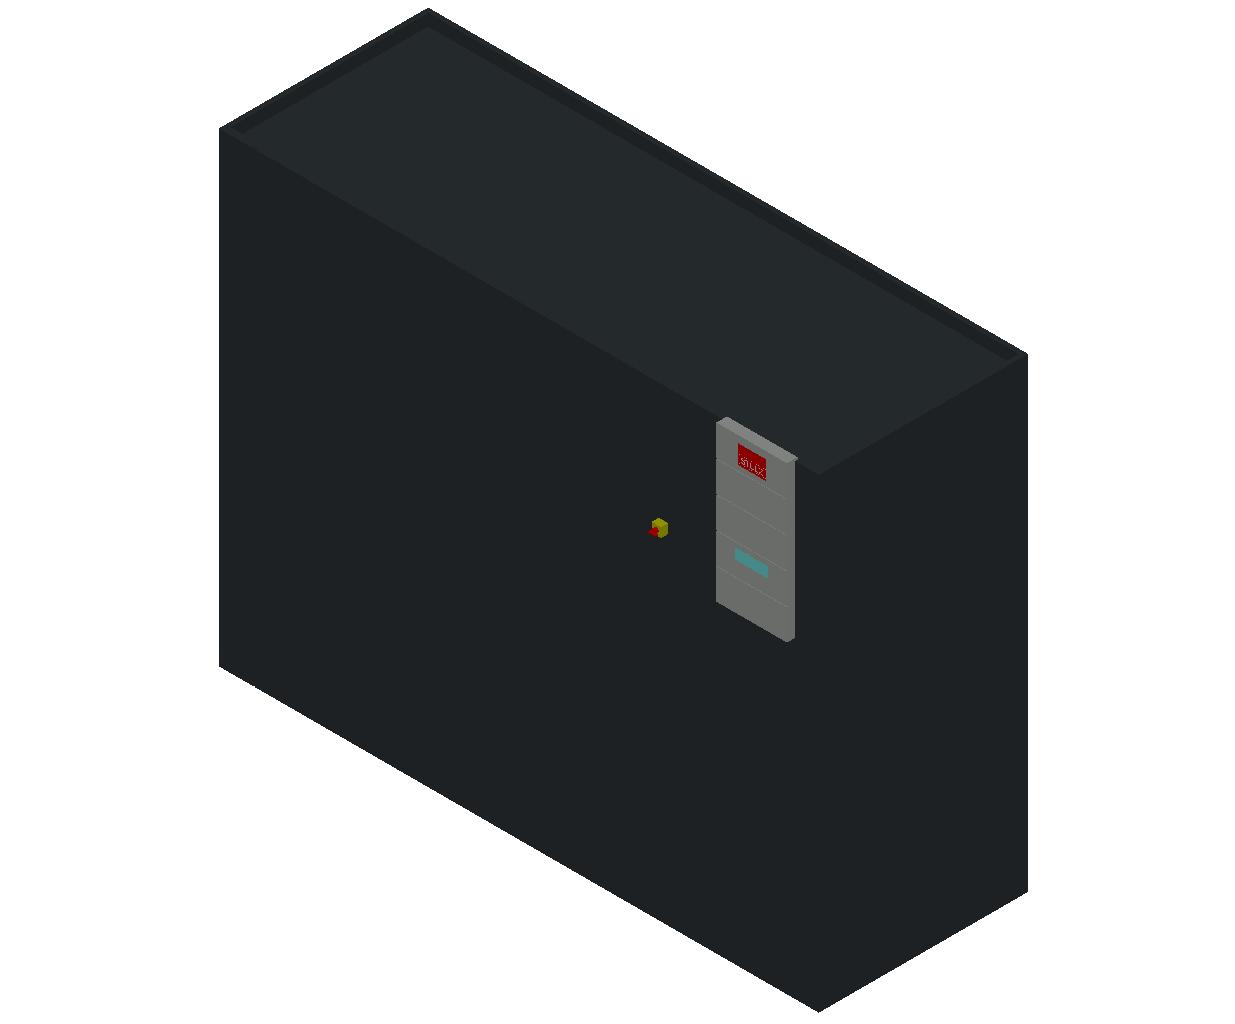 HC_Air Conditioner_Indoor Unit_MEPcontent_STULZ_CyberAir 3PRO_ALD_Dual Circuit GE_ALD_792_GE_INT-EN.dwg